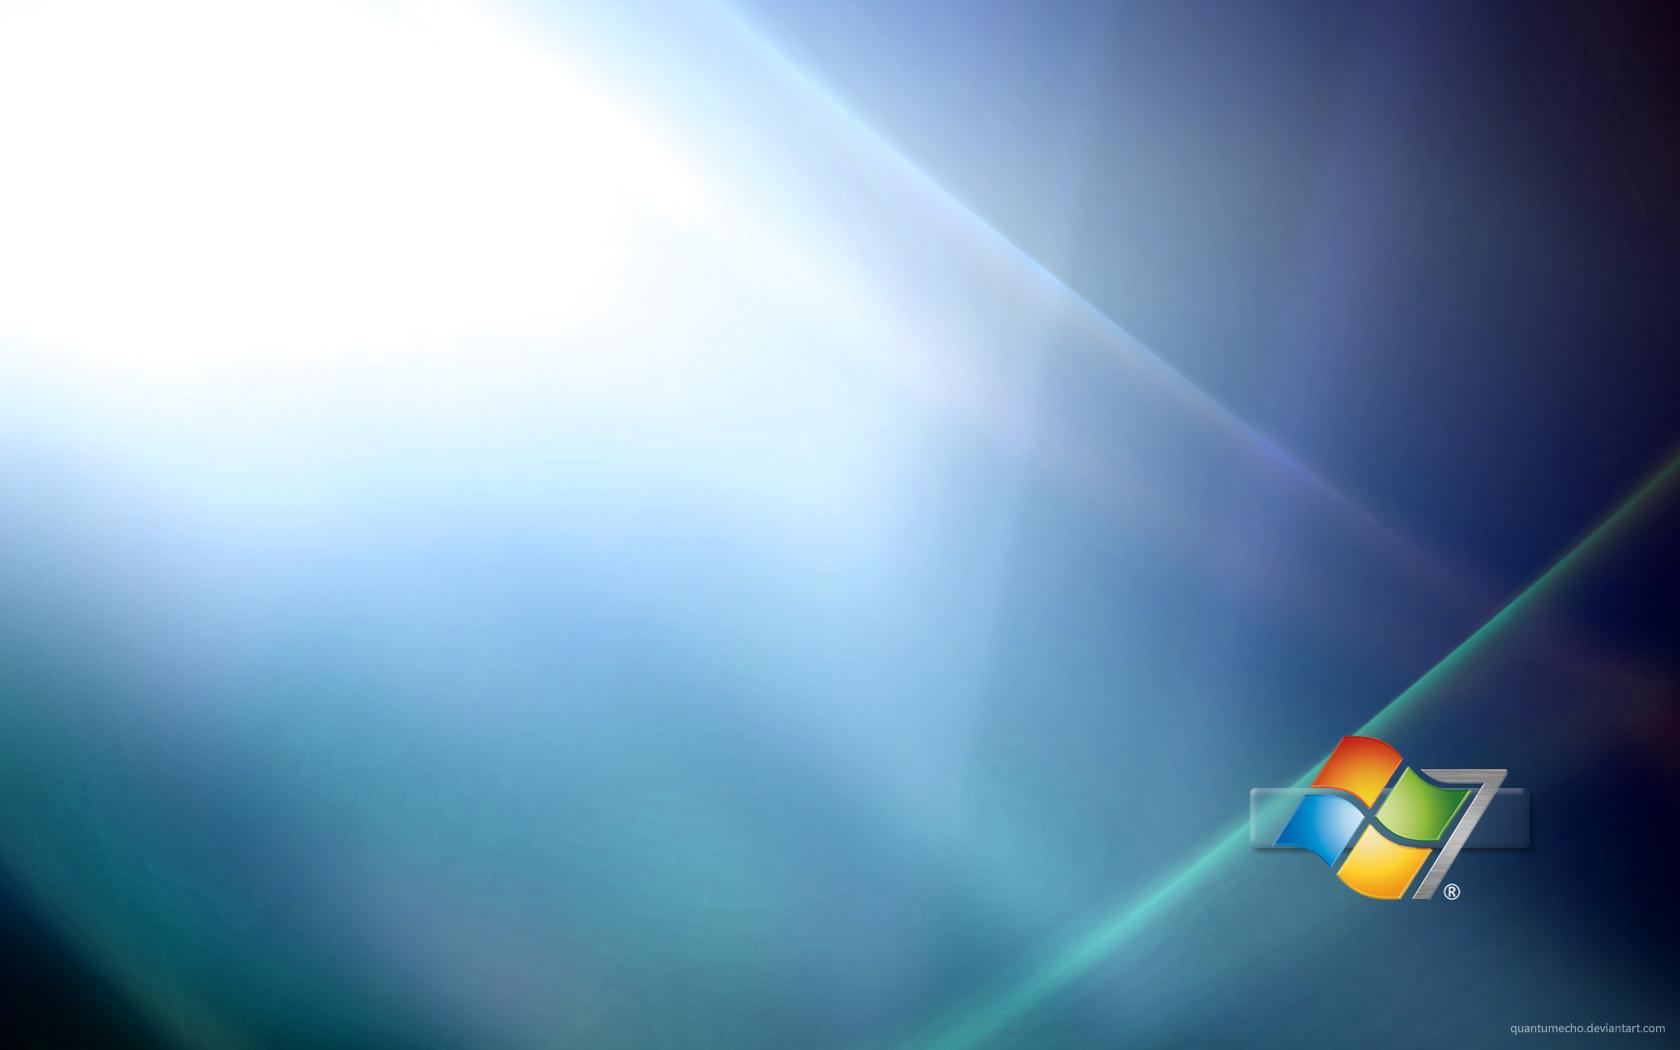 Windows 7 Widescreen Wallpaper by QuantumEcho on DeviantArt